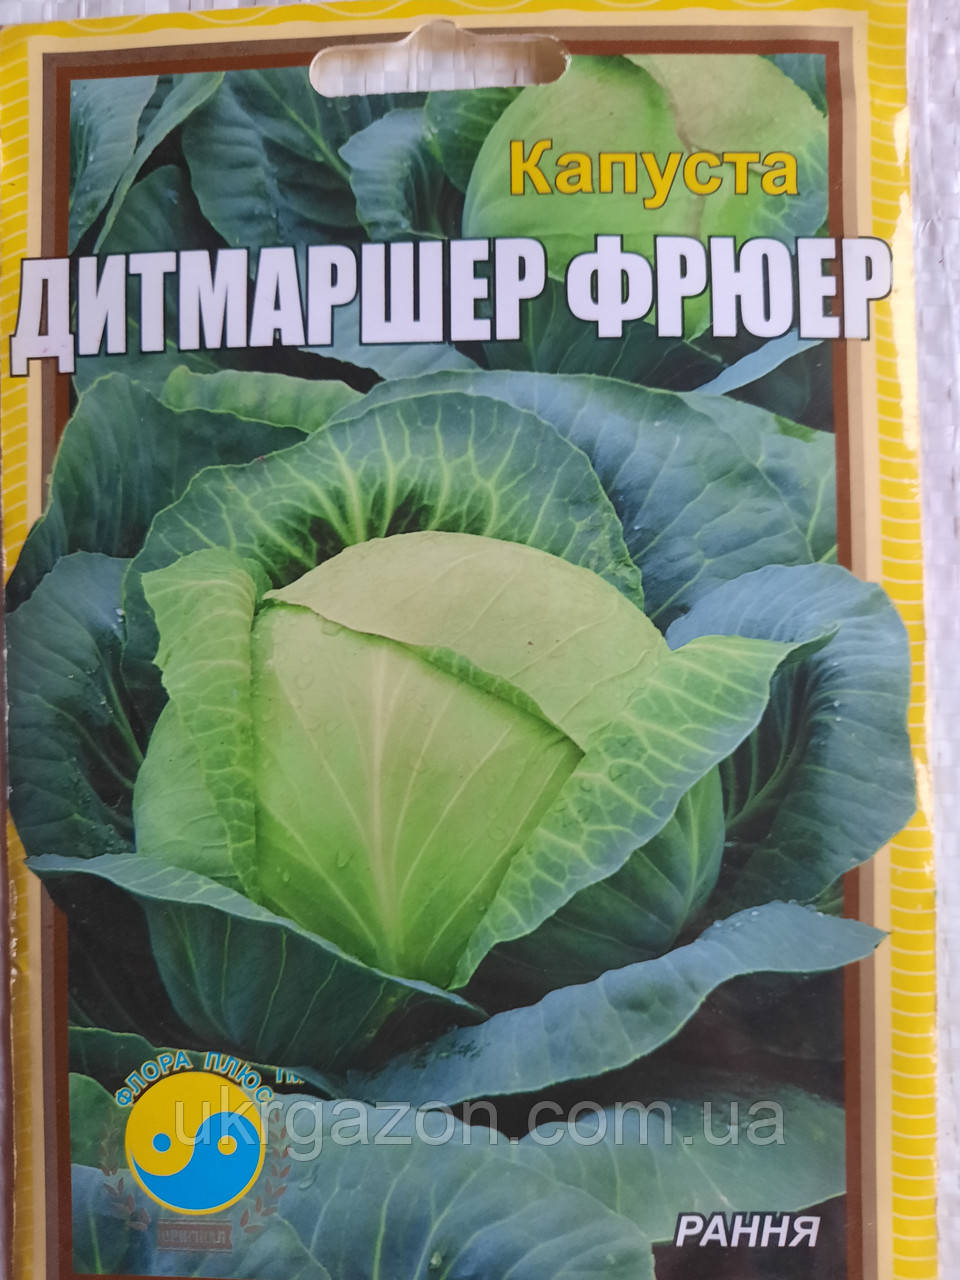 Капуста ДИТМАРШЕР ФРЮЕР 5г (ТМ Флора плюс)